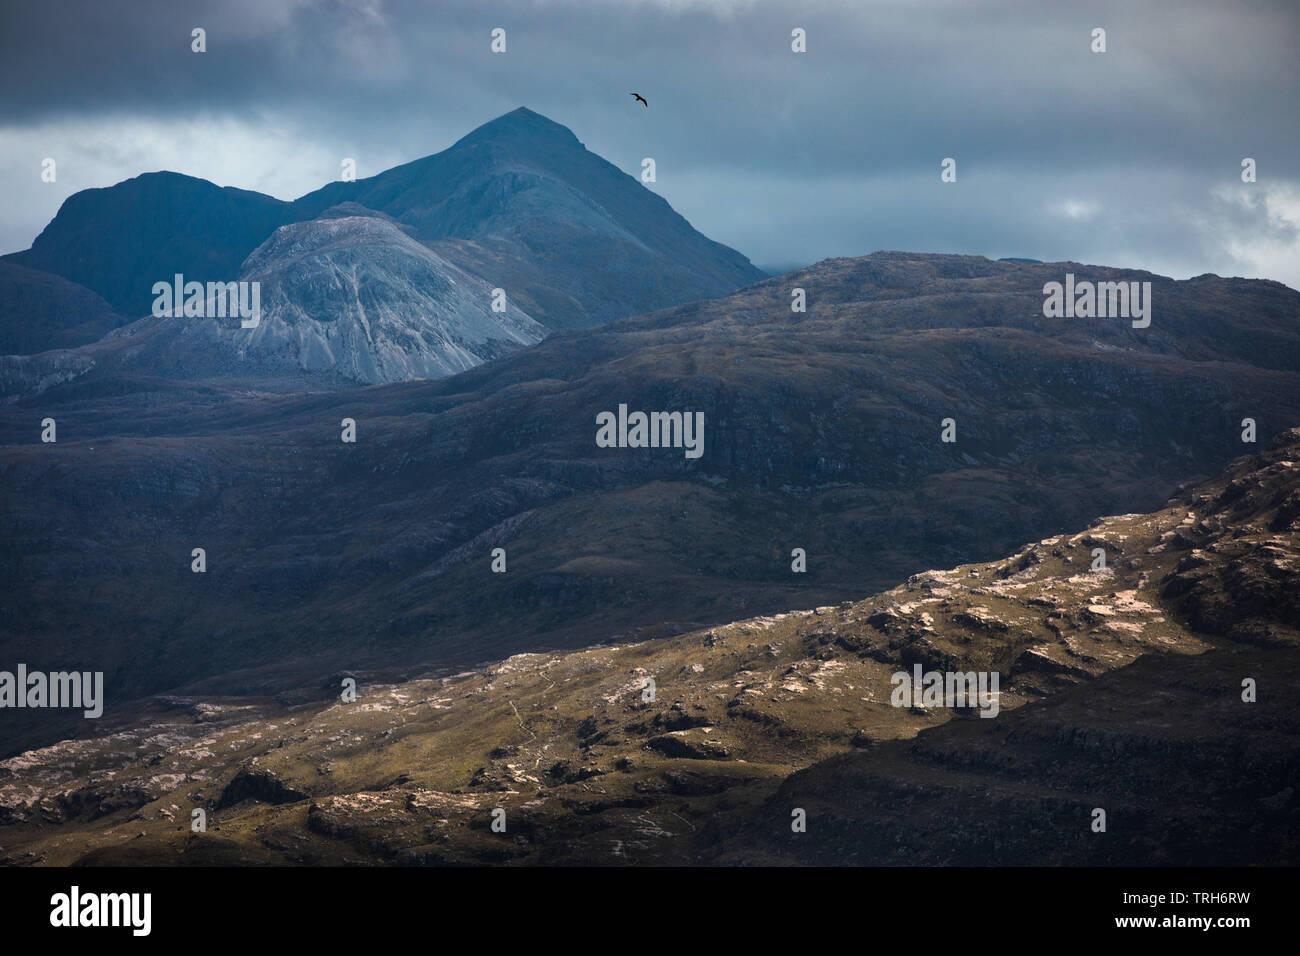 A bird soaring over the Torridon Mountains, Wester Ross, Scotland, UK - Stock Image